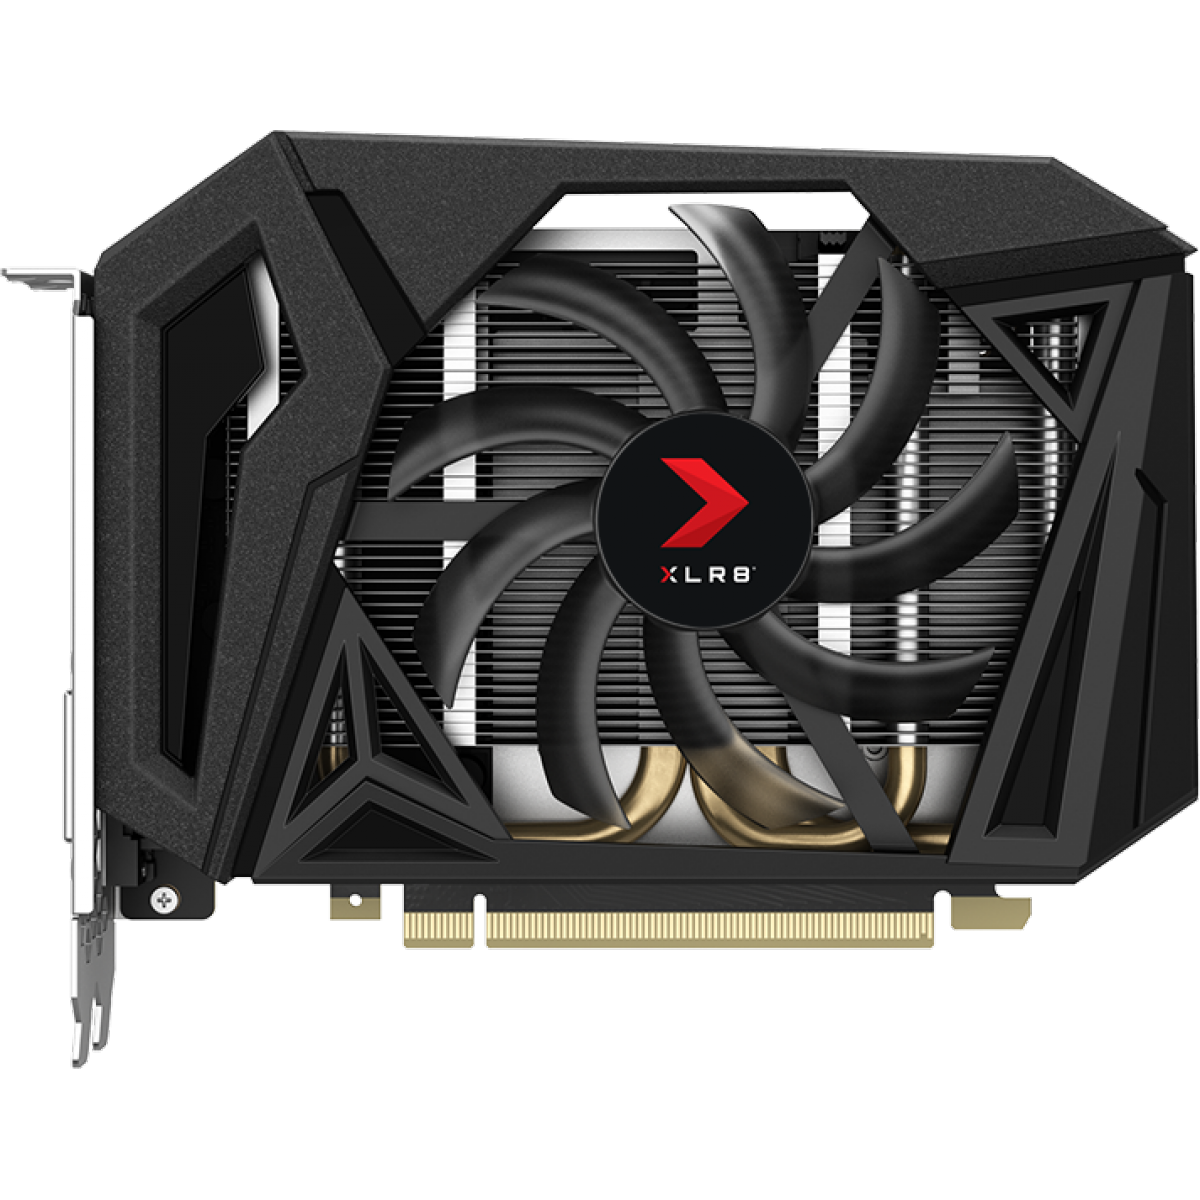 Placa de Vídeo PNY Geforce GTX 1660 XLR8 Gaming Overclocked Edition 6GB GDDR6, 192Bit, VCG16606SFPPB-O